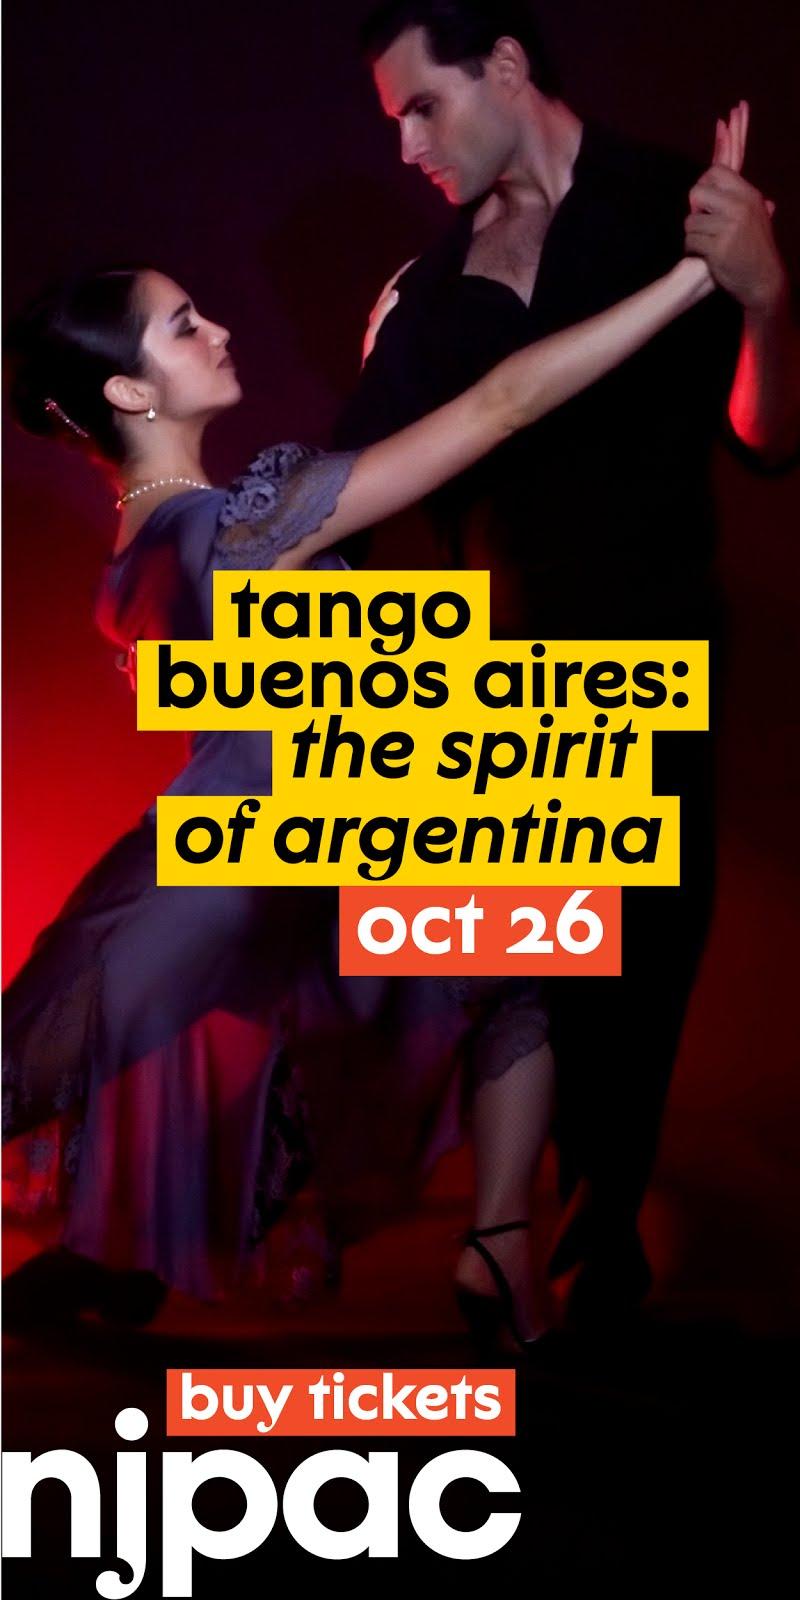 Tango at NJPAC